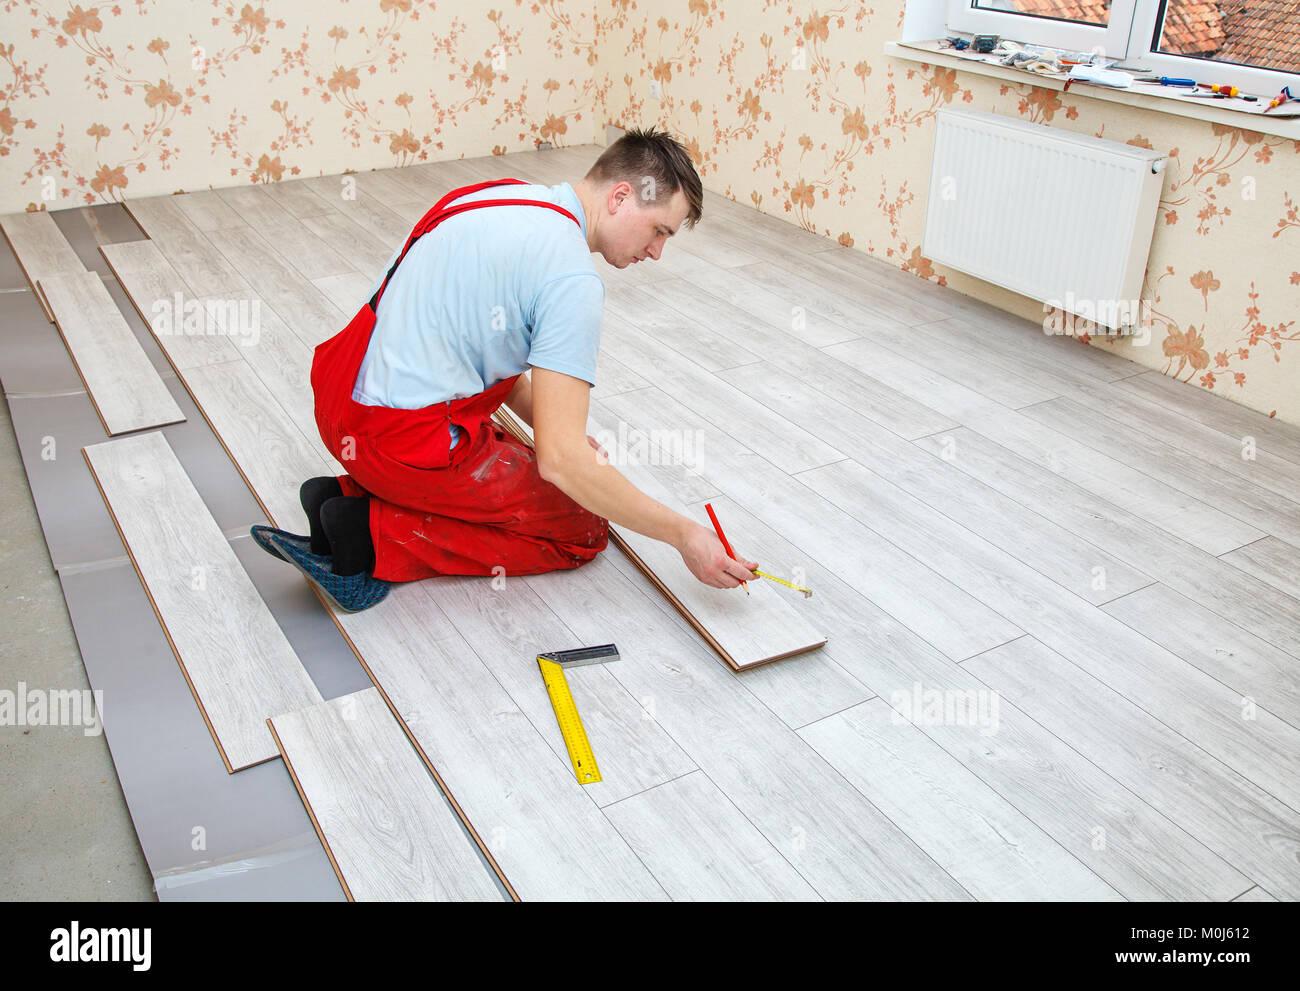 Laminate Flooring Stock Photos & Laminate Flooring Stock Images - Alamy